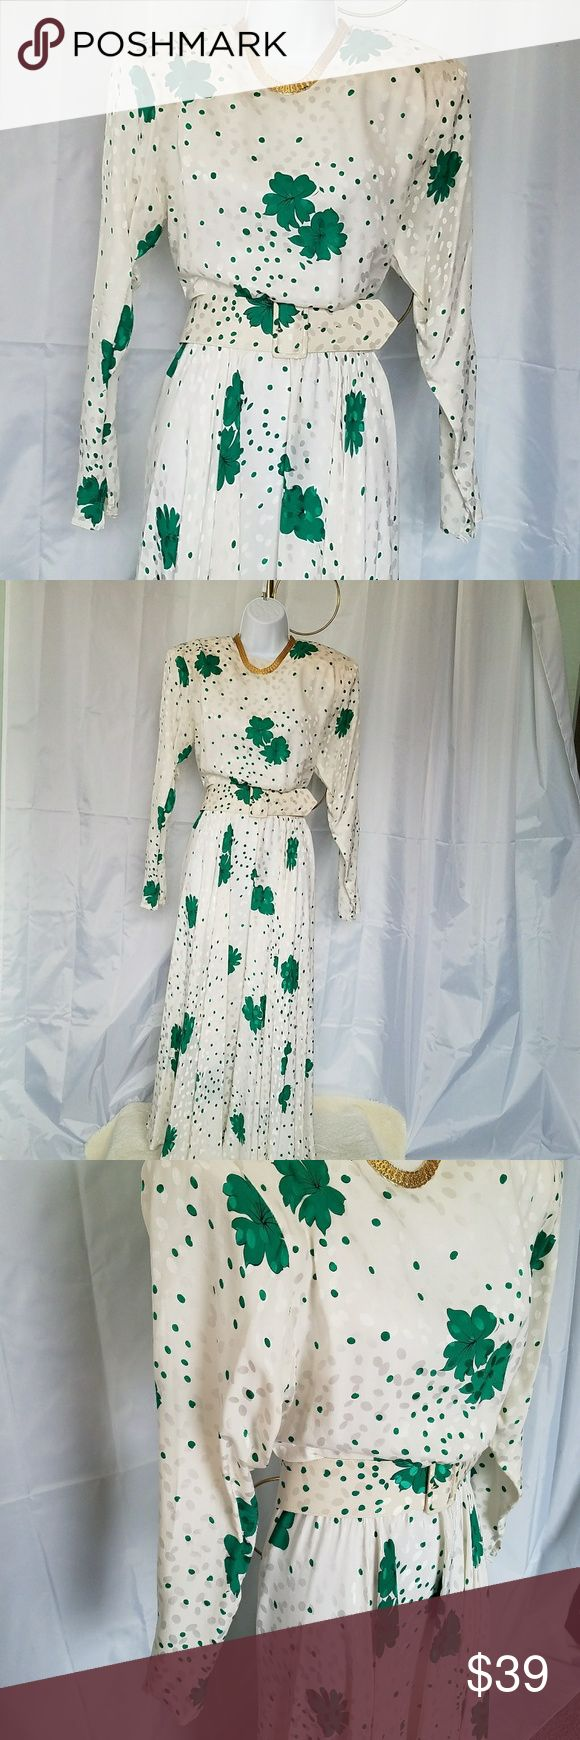 VINTAGE RAUL BLANCO CIRCLE SKIRT DRESS 8 VINTAGE RAUL BLANCO CIRCLE SKIRT BELTED DRESS. This a gorgeous dress. Size 8. Measurements will follow soon. Vintage Dresses Midi